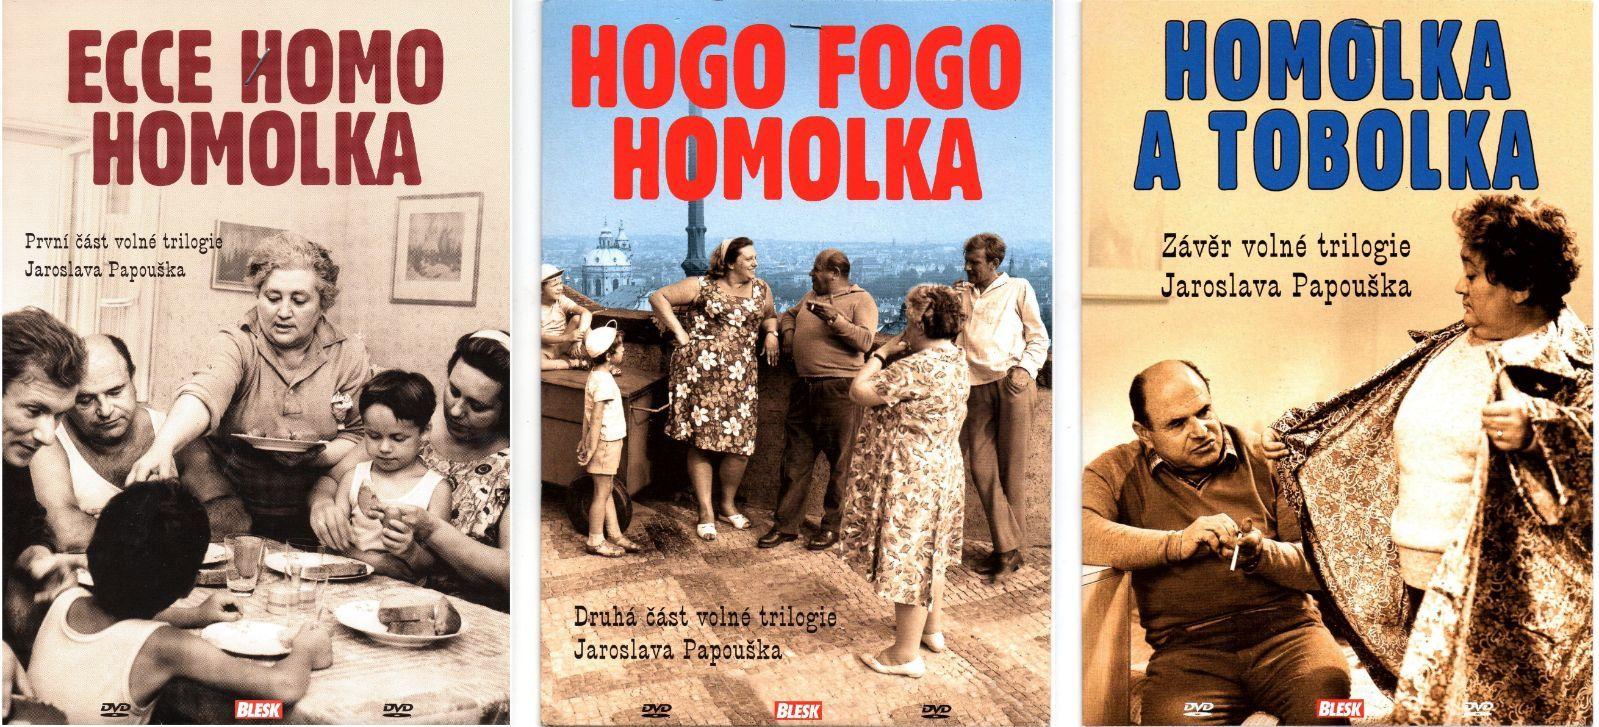 ecce-homo-homolka-homolka-a-tobolka-hogo-fogo-homolka-3-x-dvd-collection